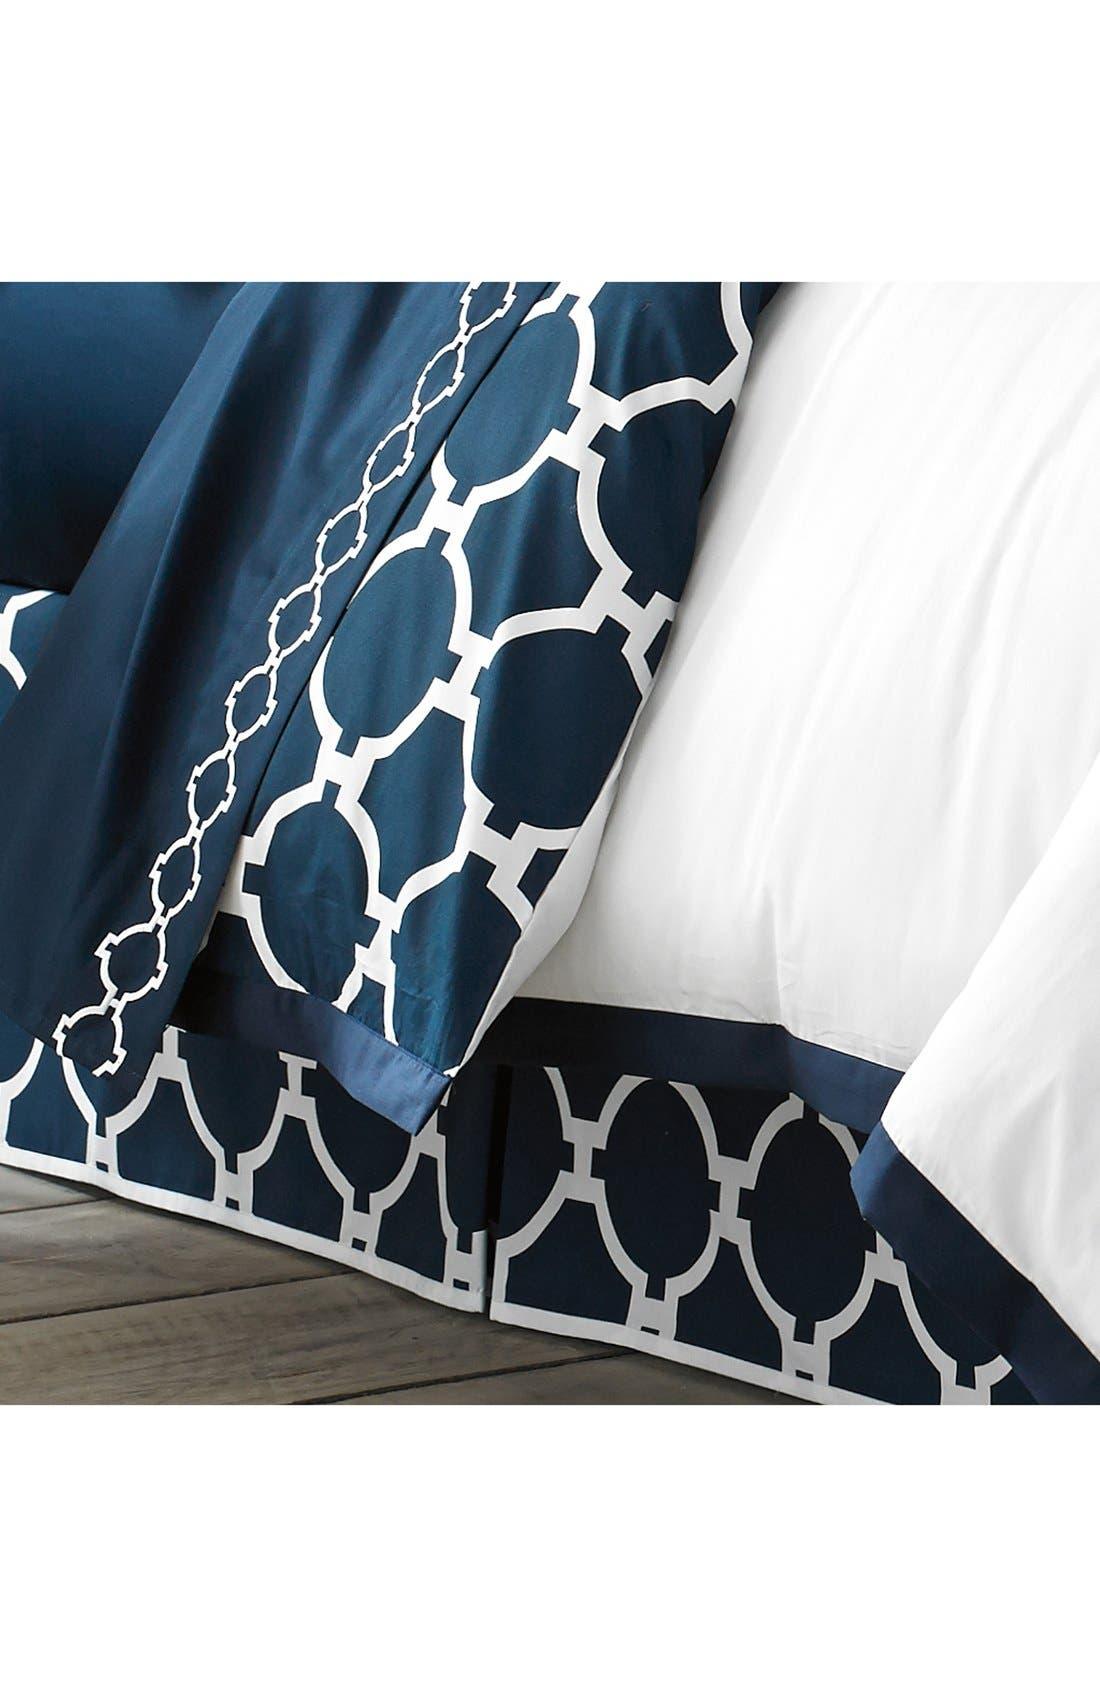 Alternate Image 1 Selected - Jill Rosenwald 'Copley Hampton Links' Bed Skirt